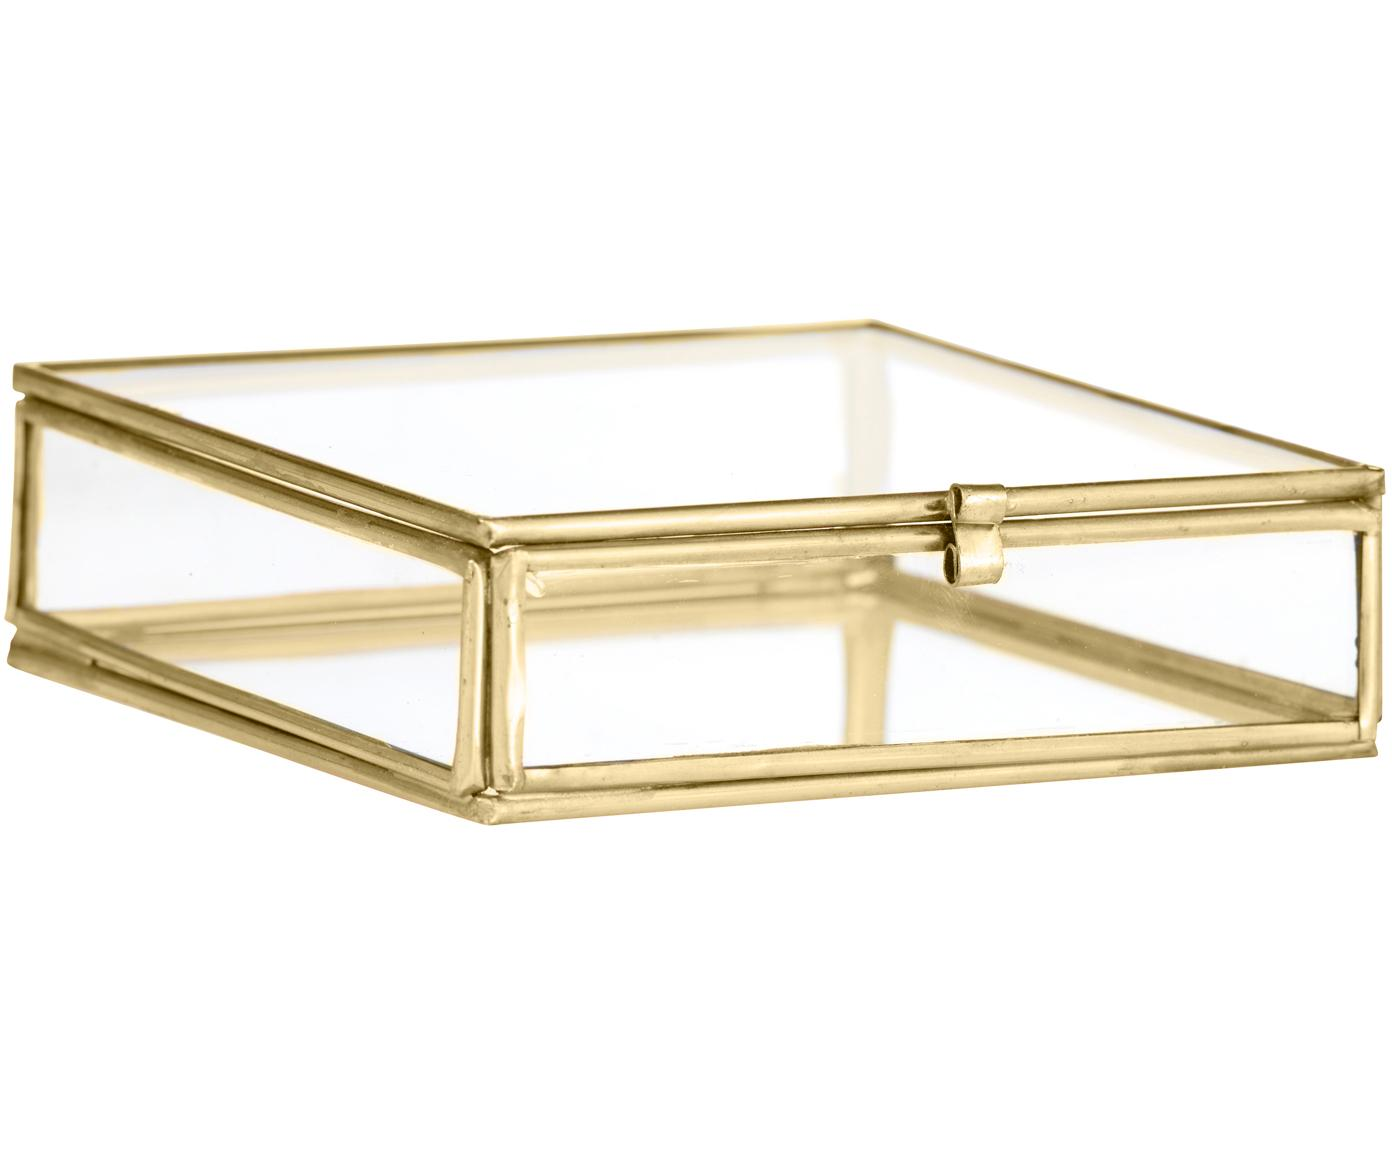 Portagioie Ivey, Struttura: metallo rivestito, Ottonato, Larg. 11 x Alt. 4 cm